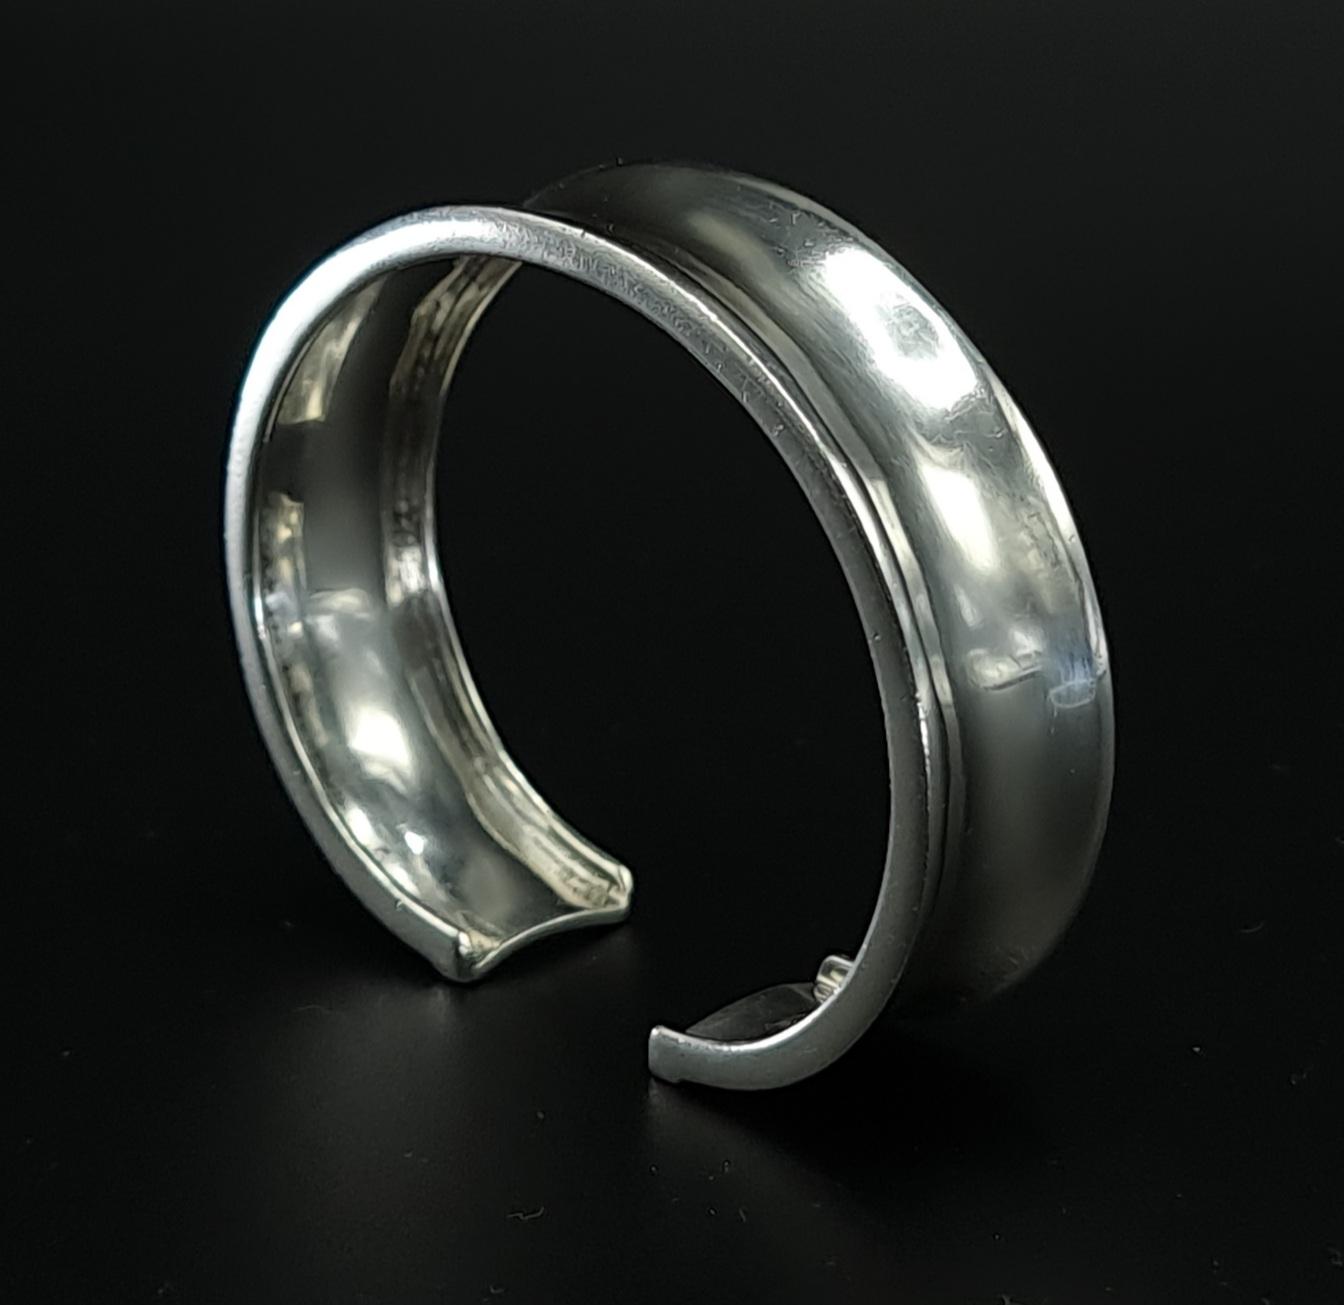 zilveren armband 925 zilver sterling zsilver bracelet stijve armband zilver skoander.com